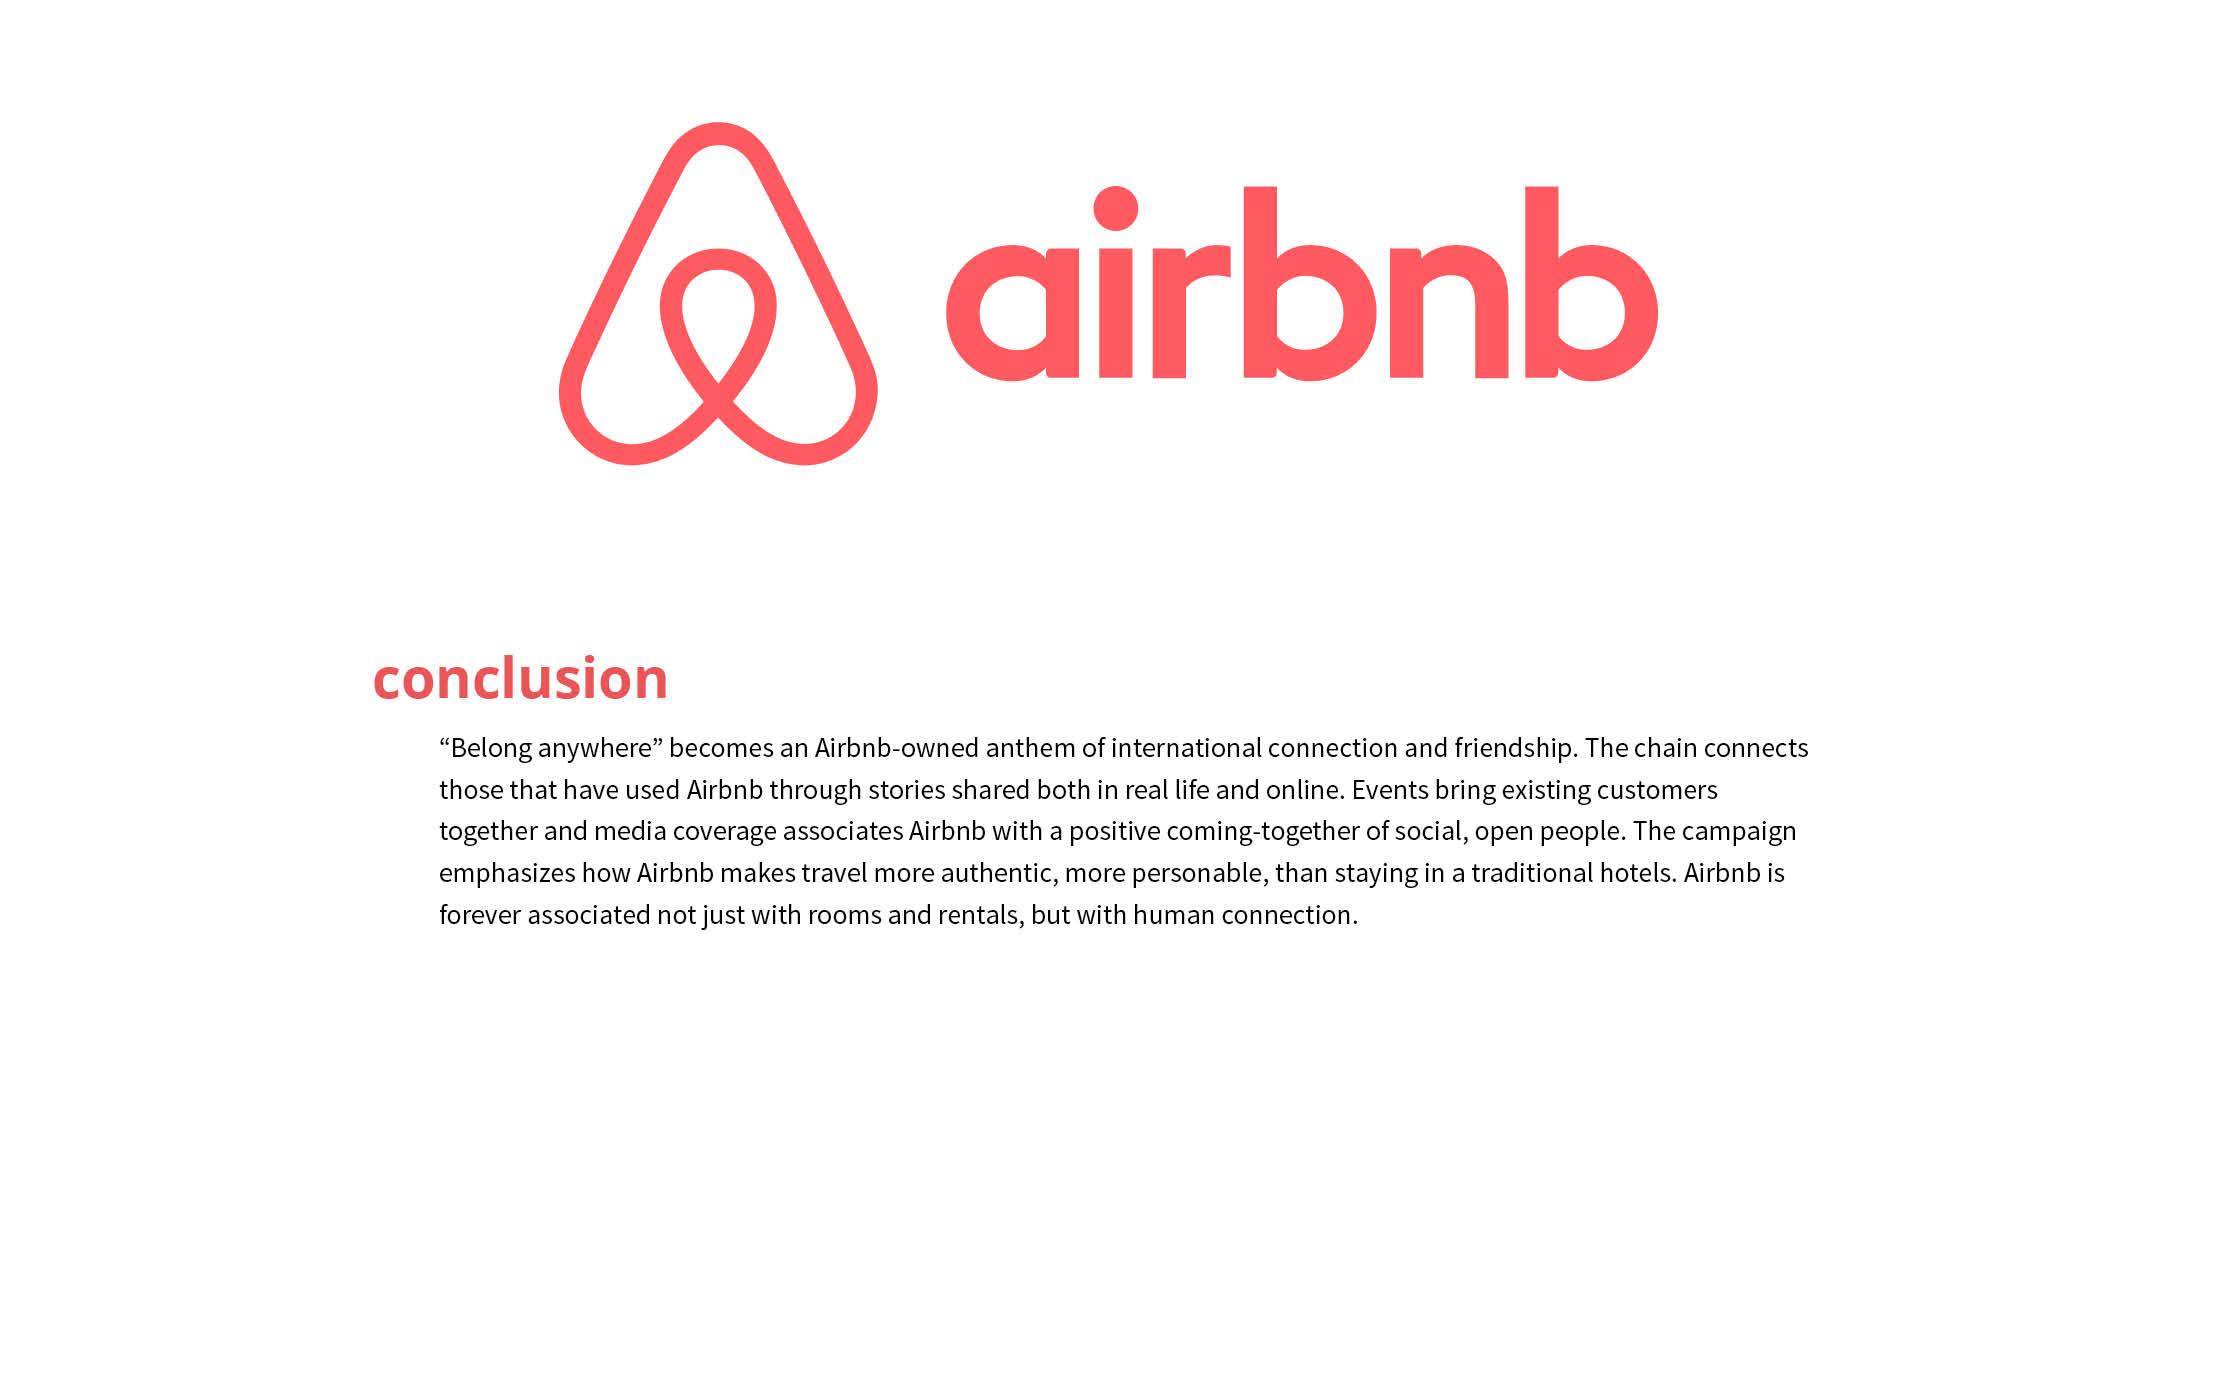 airbnb case study8.jpg